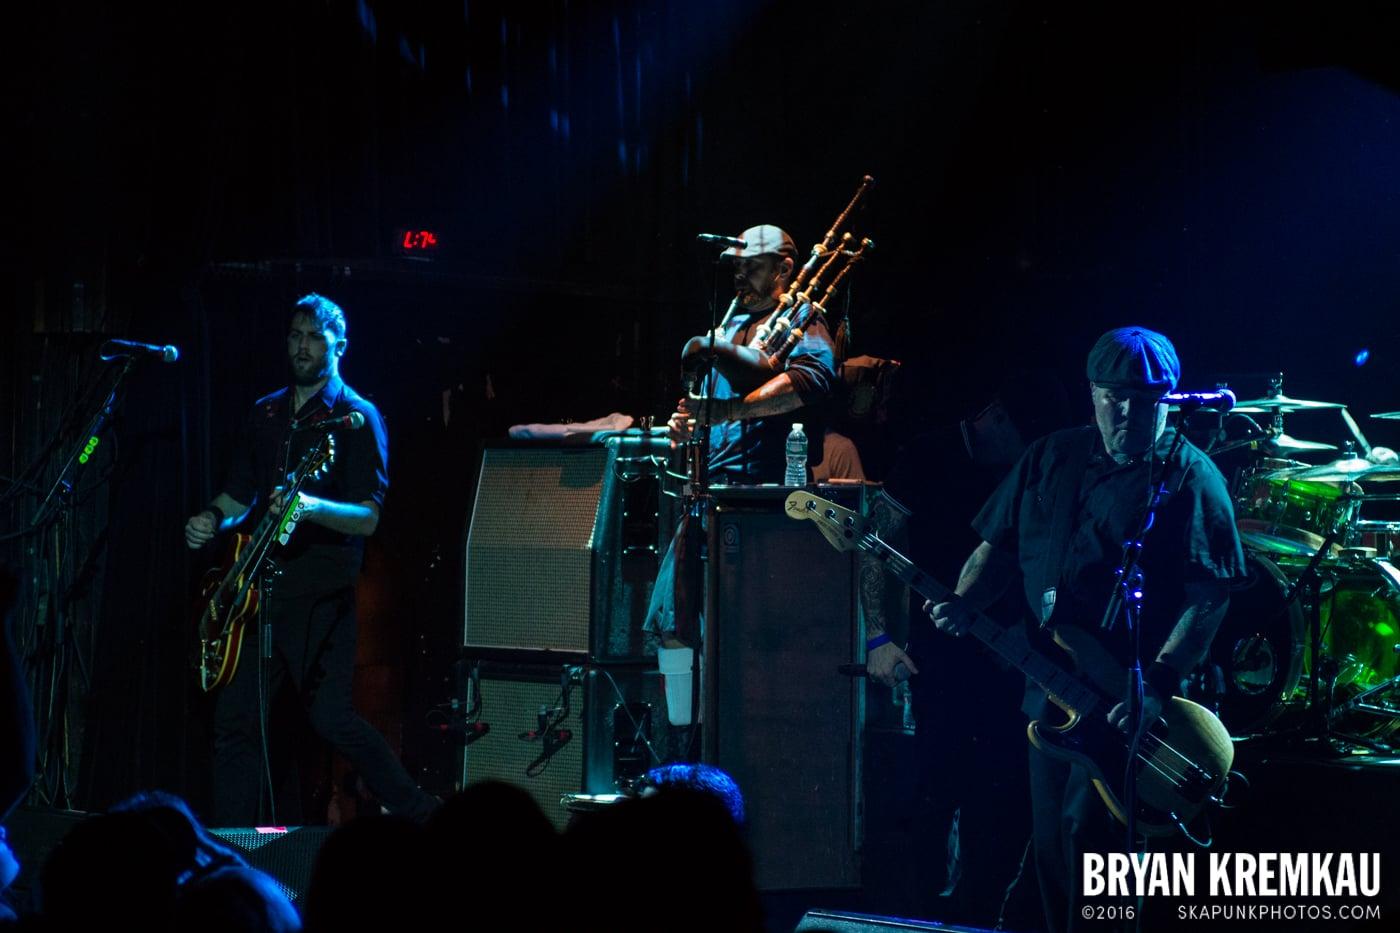 The Dropkick Murphys @ Irving Plaza, NYC - 3.9.15 (6)